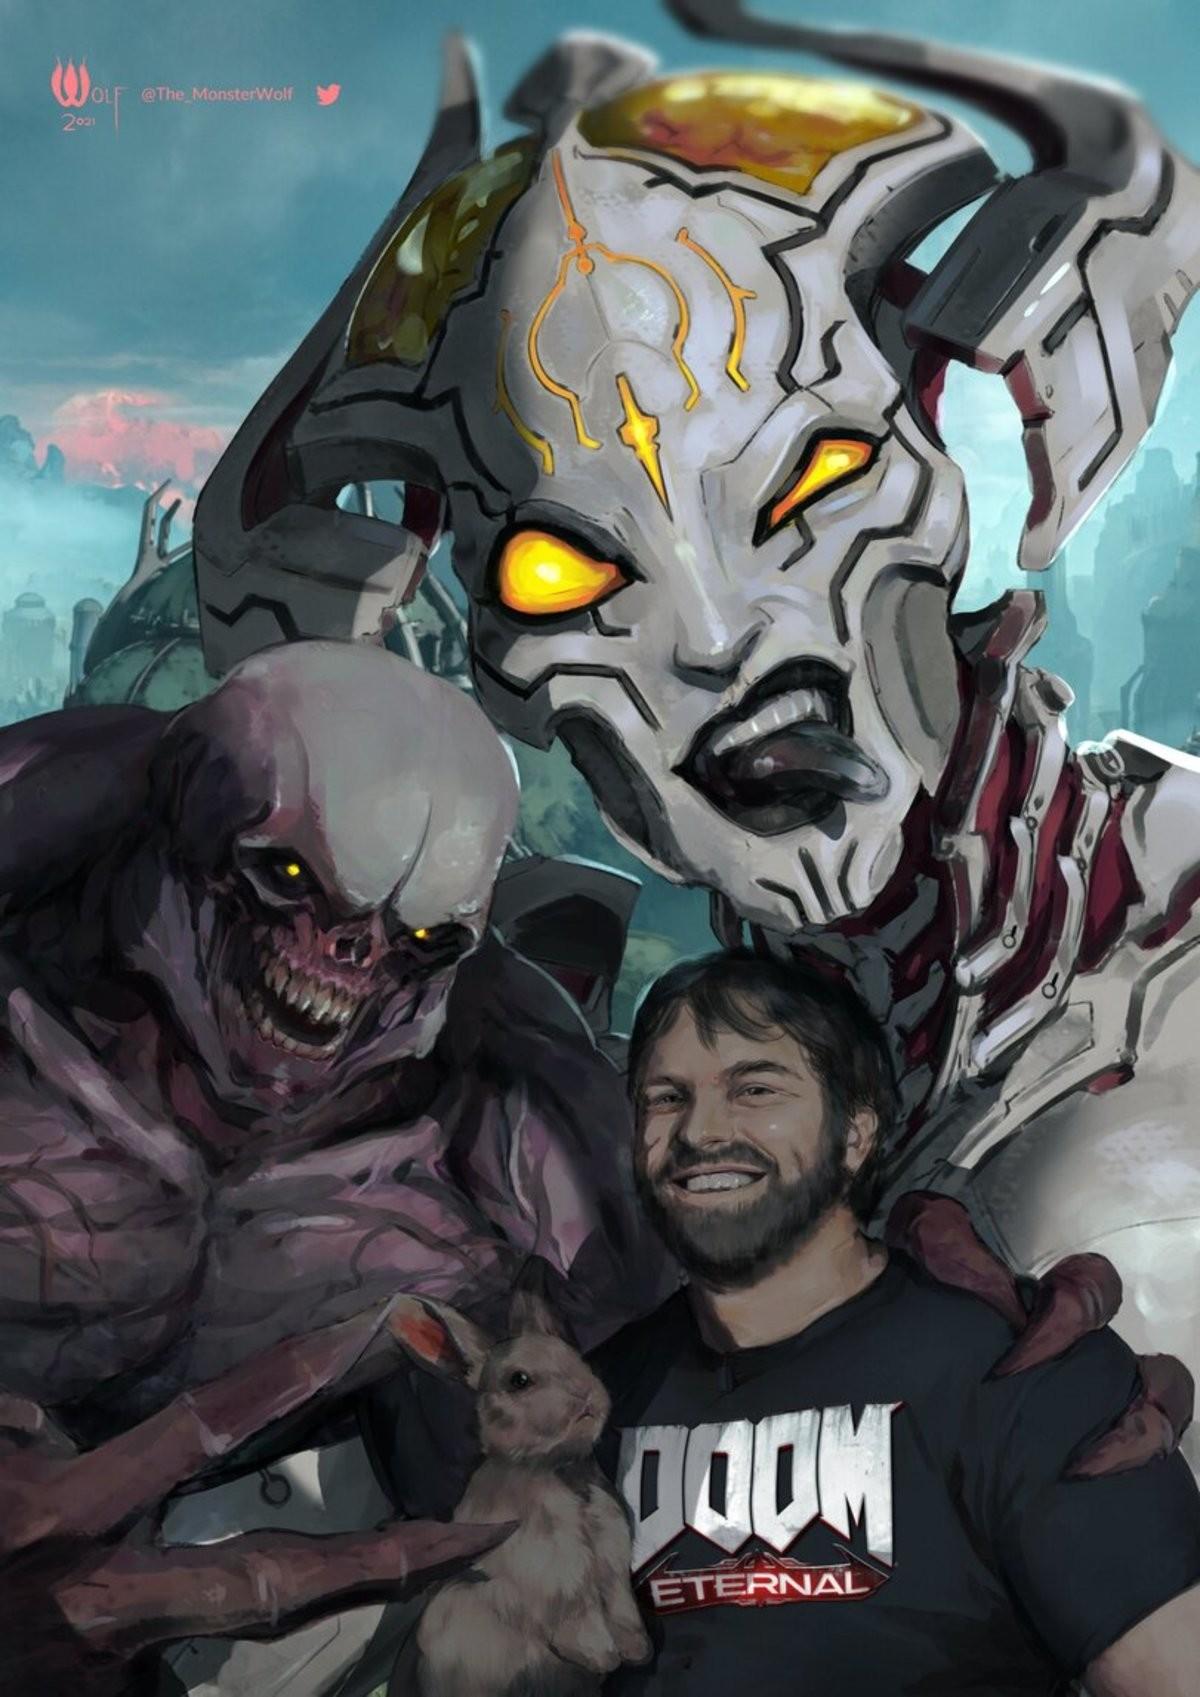 The_MonsterWolf. .. Oh no Flirty hot Khan Makyr